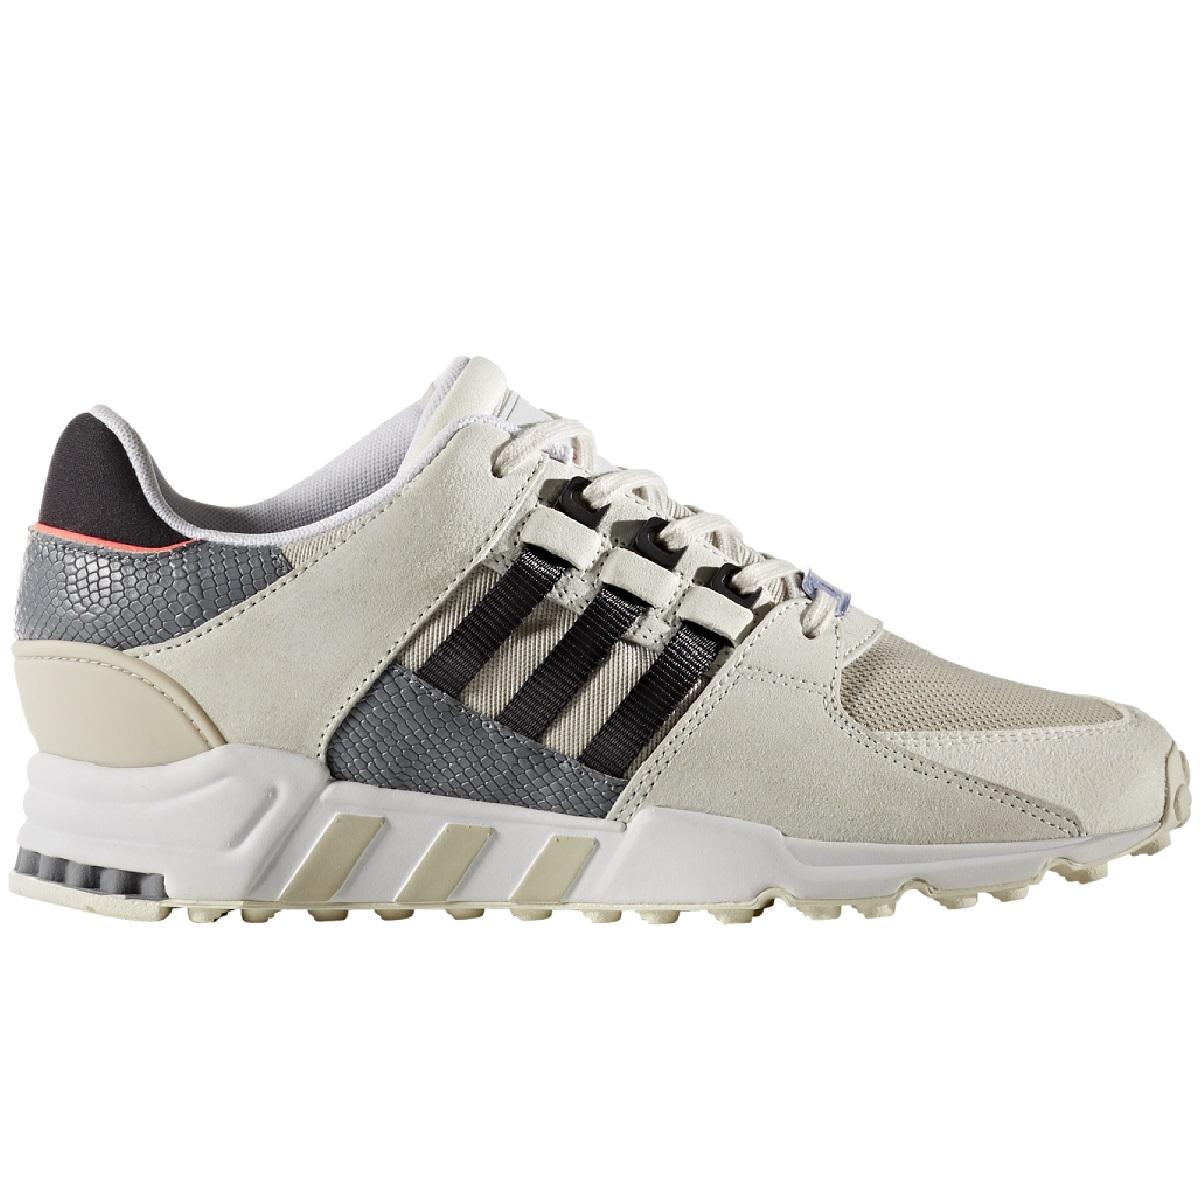 adidas originals eqt support rf sneaker damen schuhe beige bb2352 sport klingenmaier. Black Bedroom Furniture Sets. Home Design Ideas